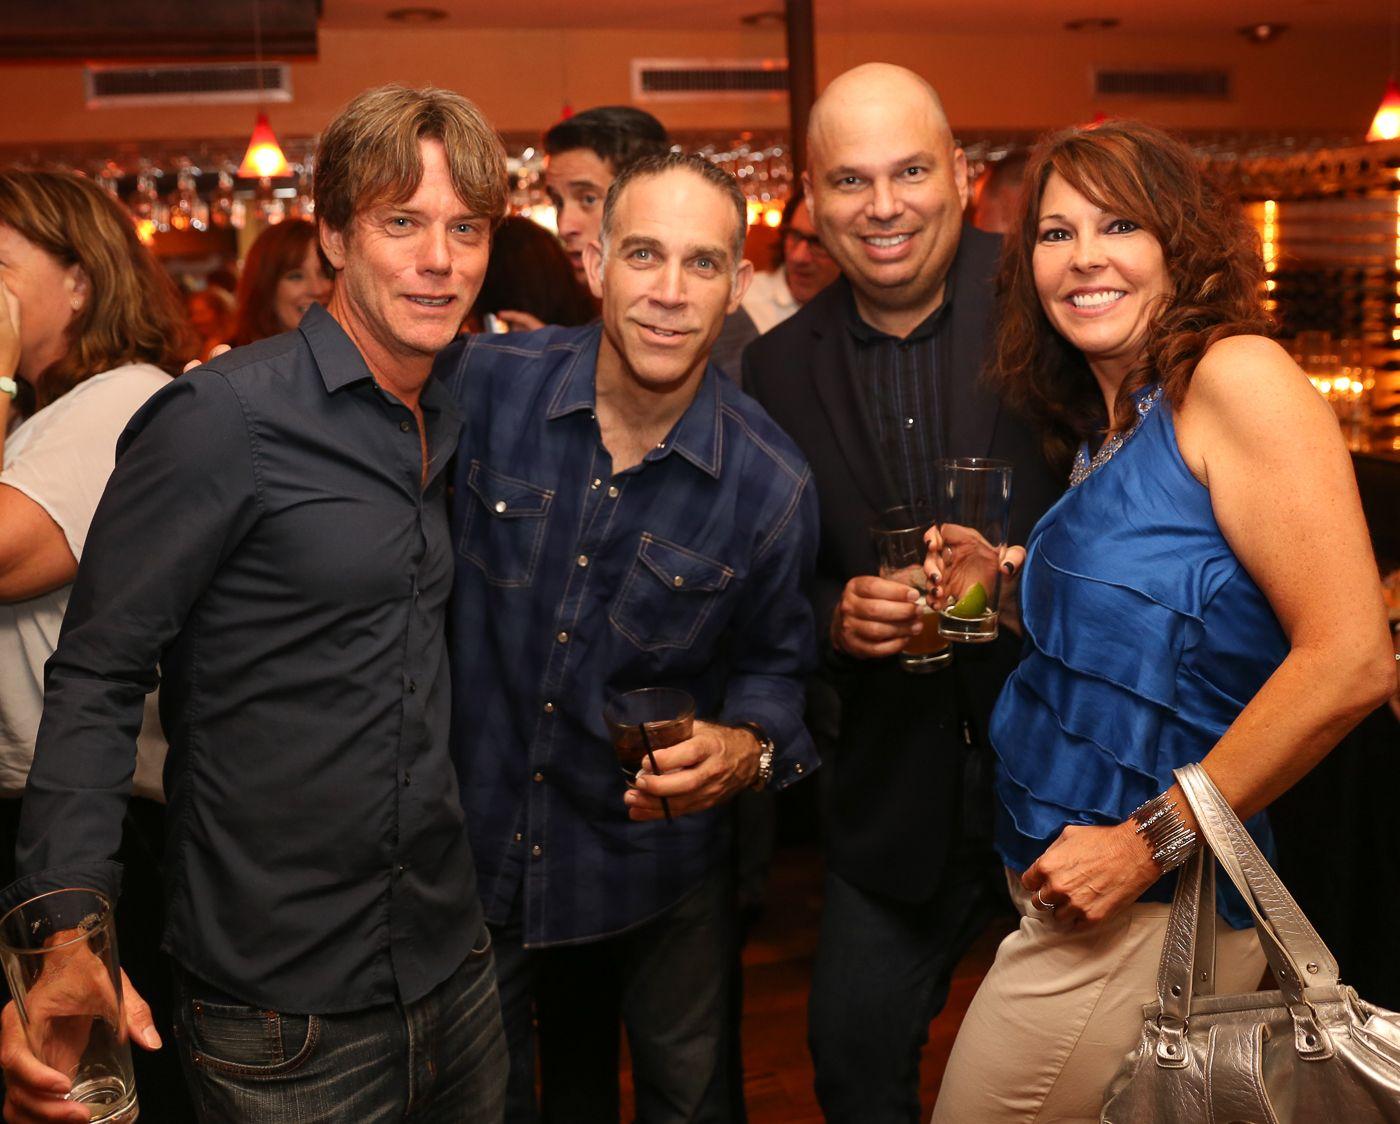 2015 07-24 Boca-Ciega-High-School-30th-Reunion-at-venue-NOVA-535-downtown-StPete-58